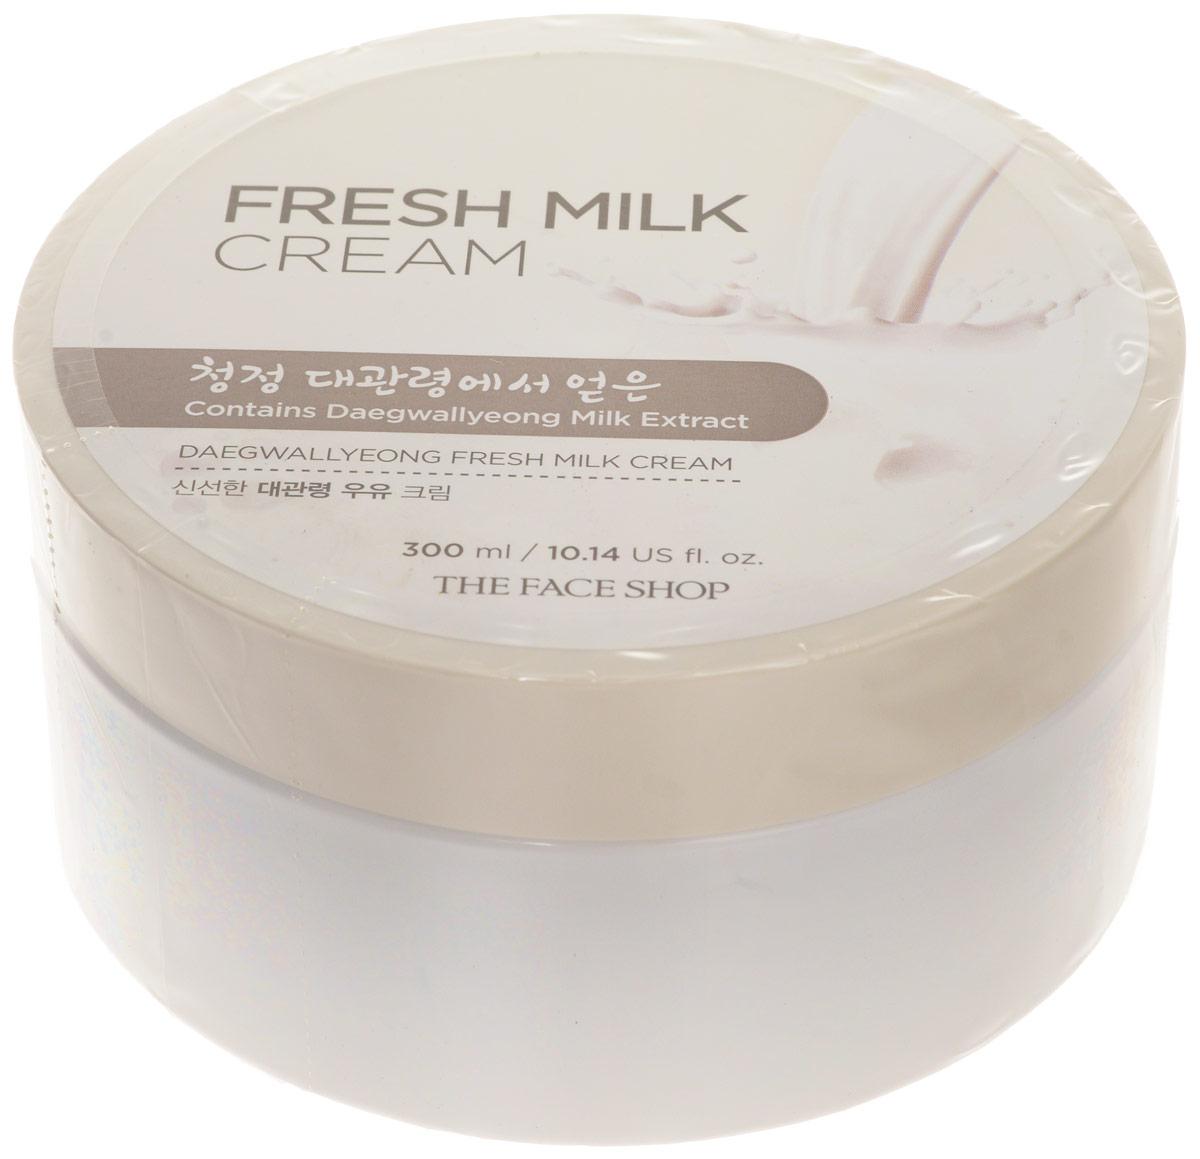 The Face Shop Fresh Milk Cream Крем для лица и тела молочный, 300 мл безмасляная пенка для умывания с экстрактом семян чиа the face shop chia seed fresh bubble foаm